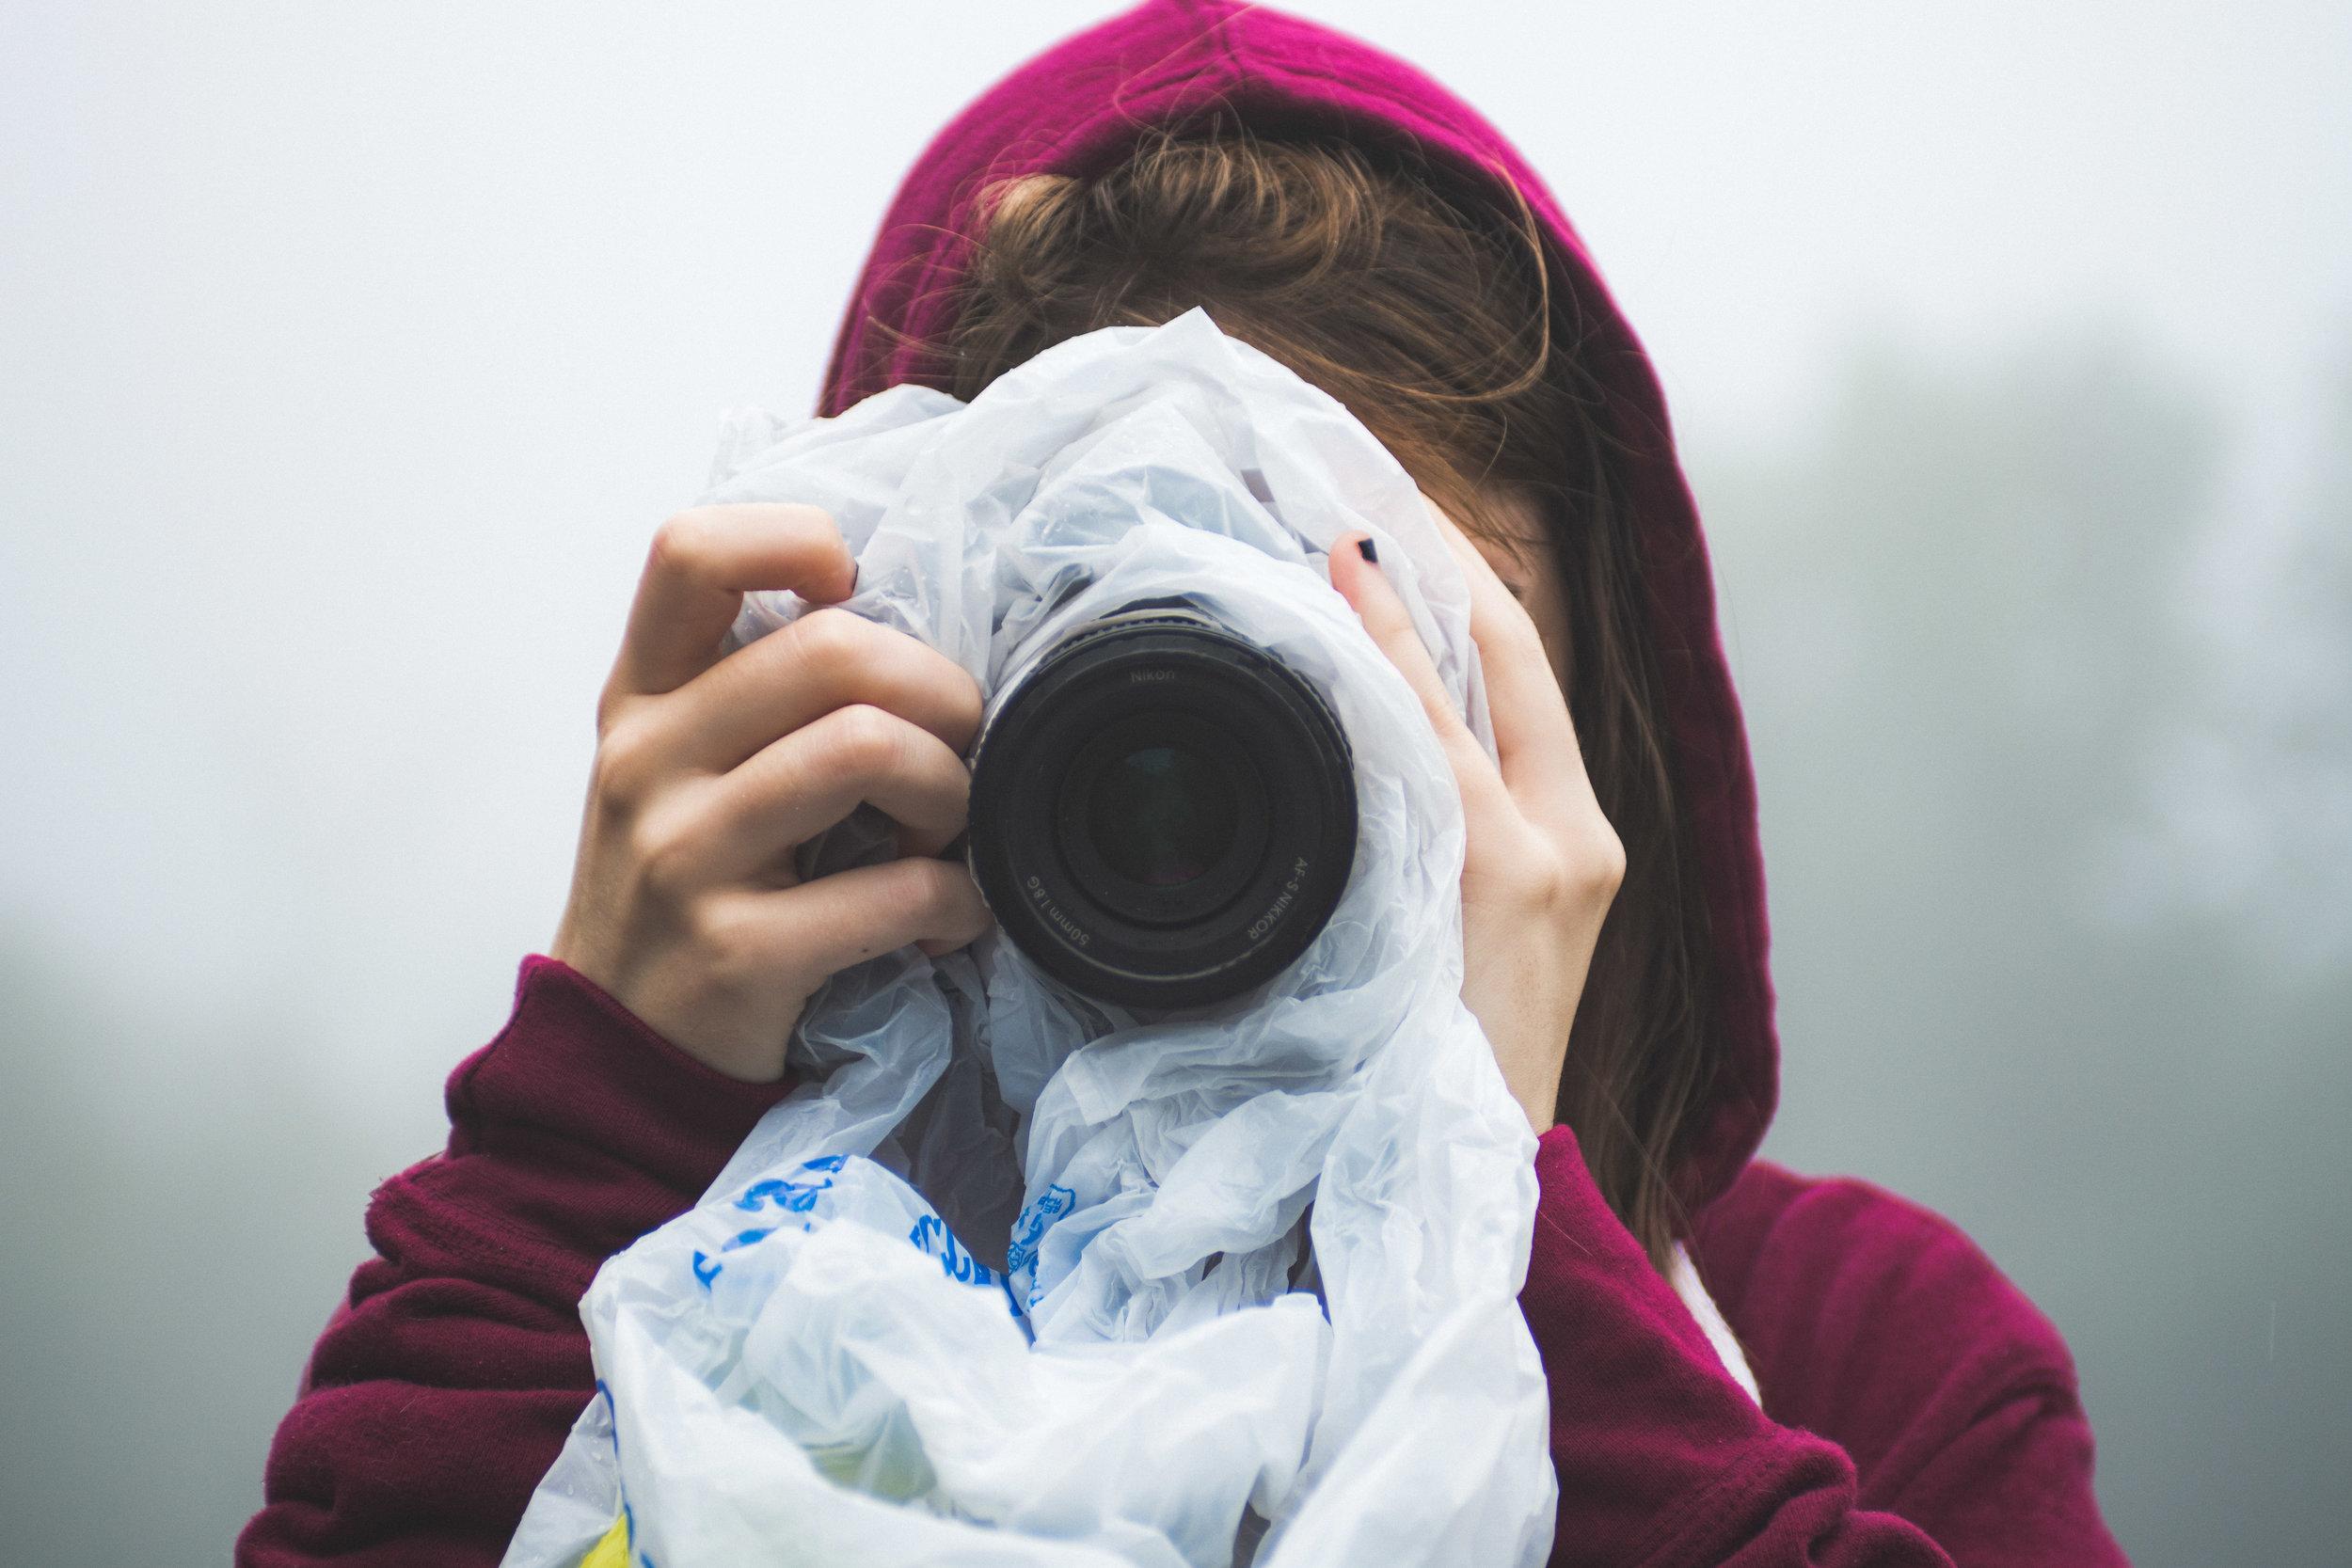 jelly camera.jpg